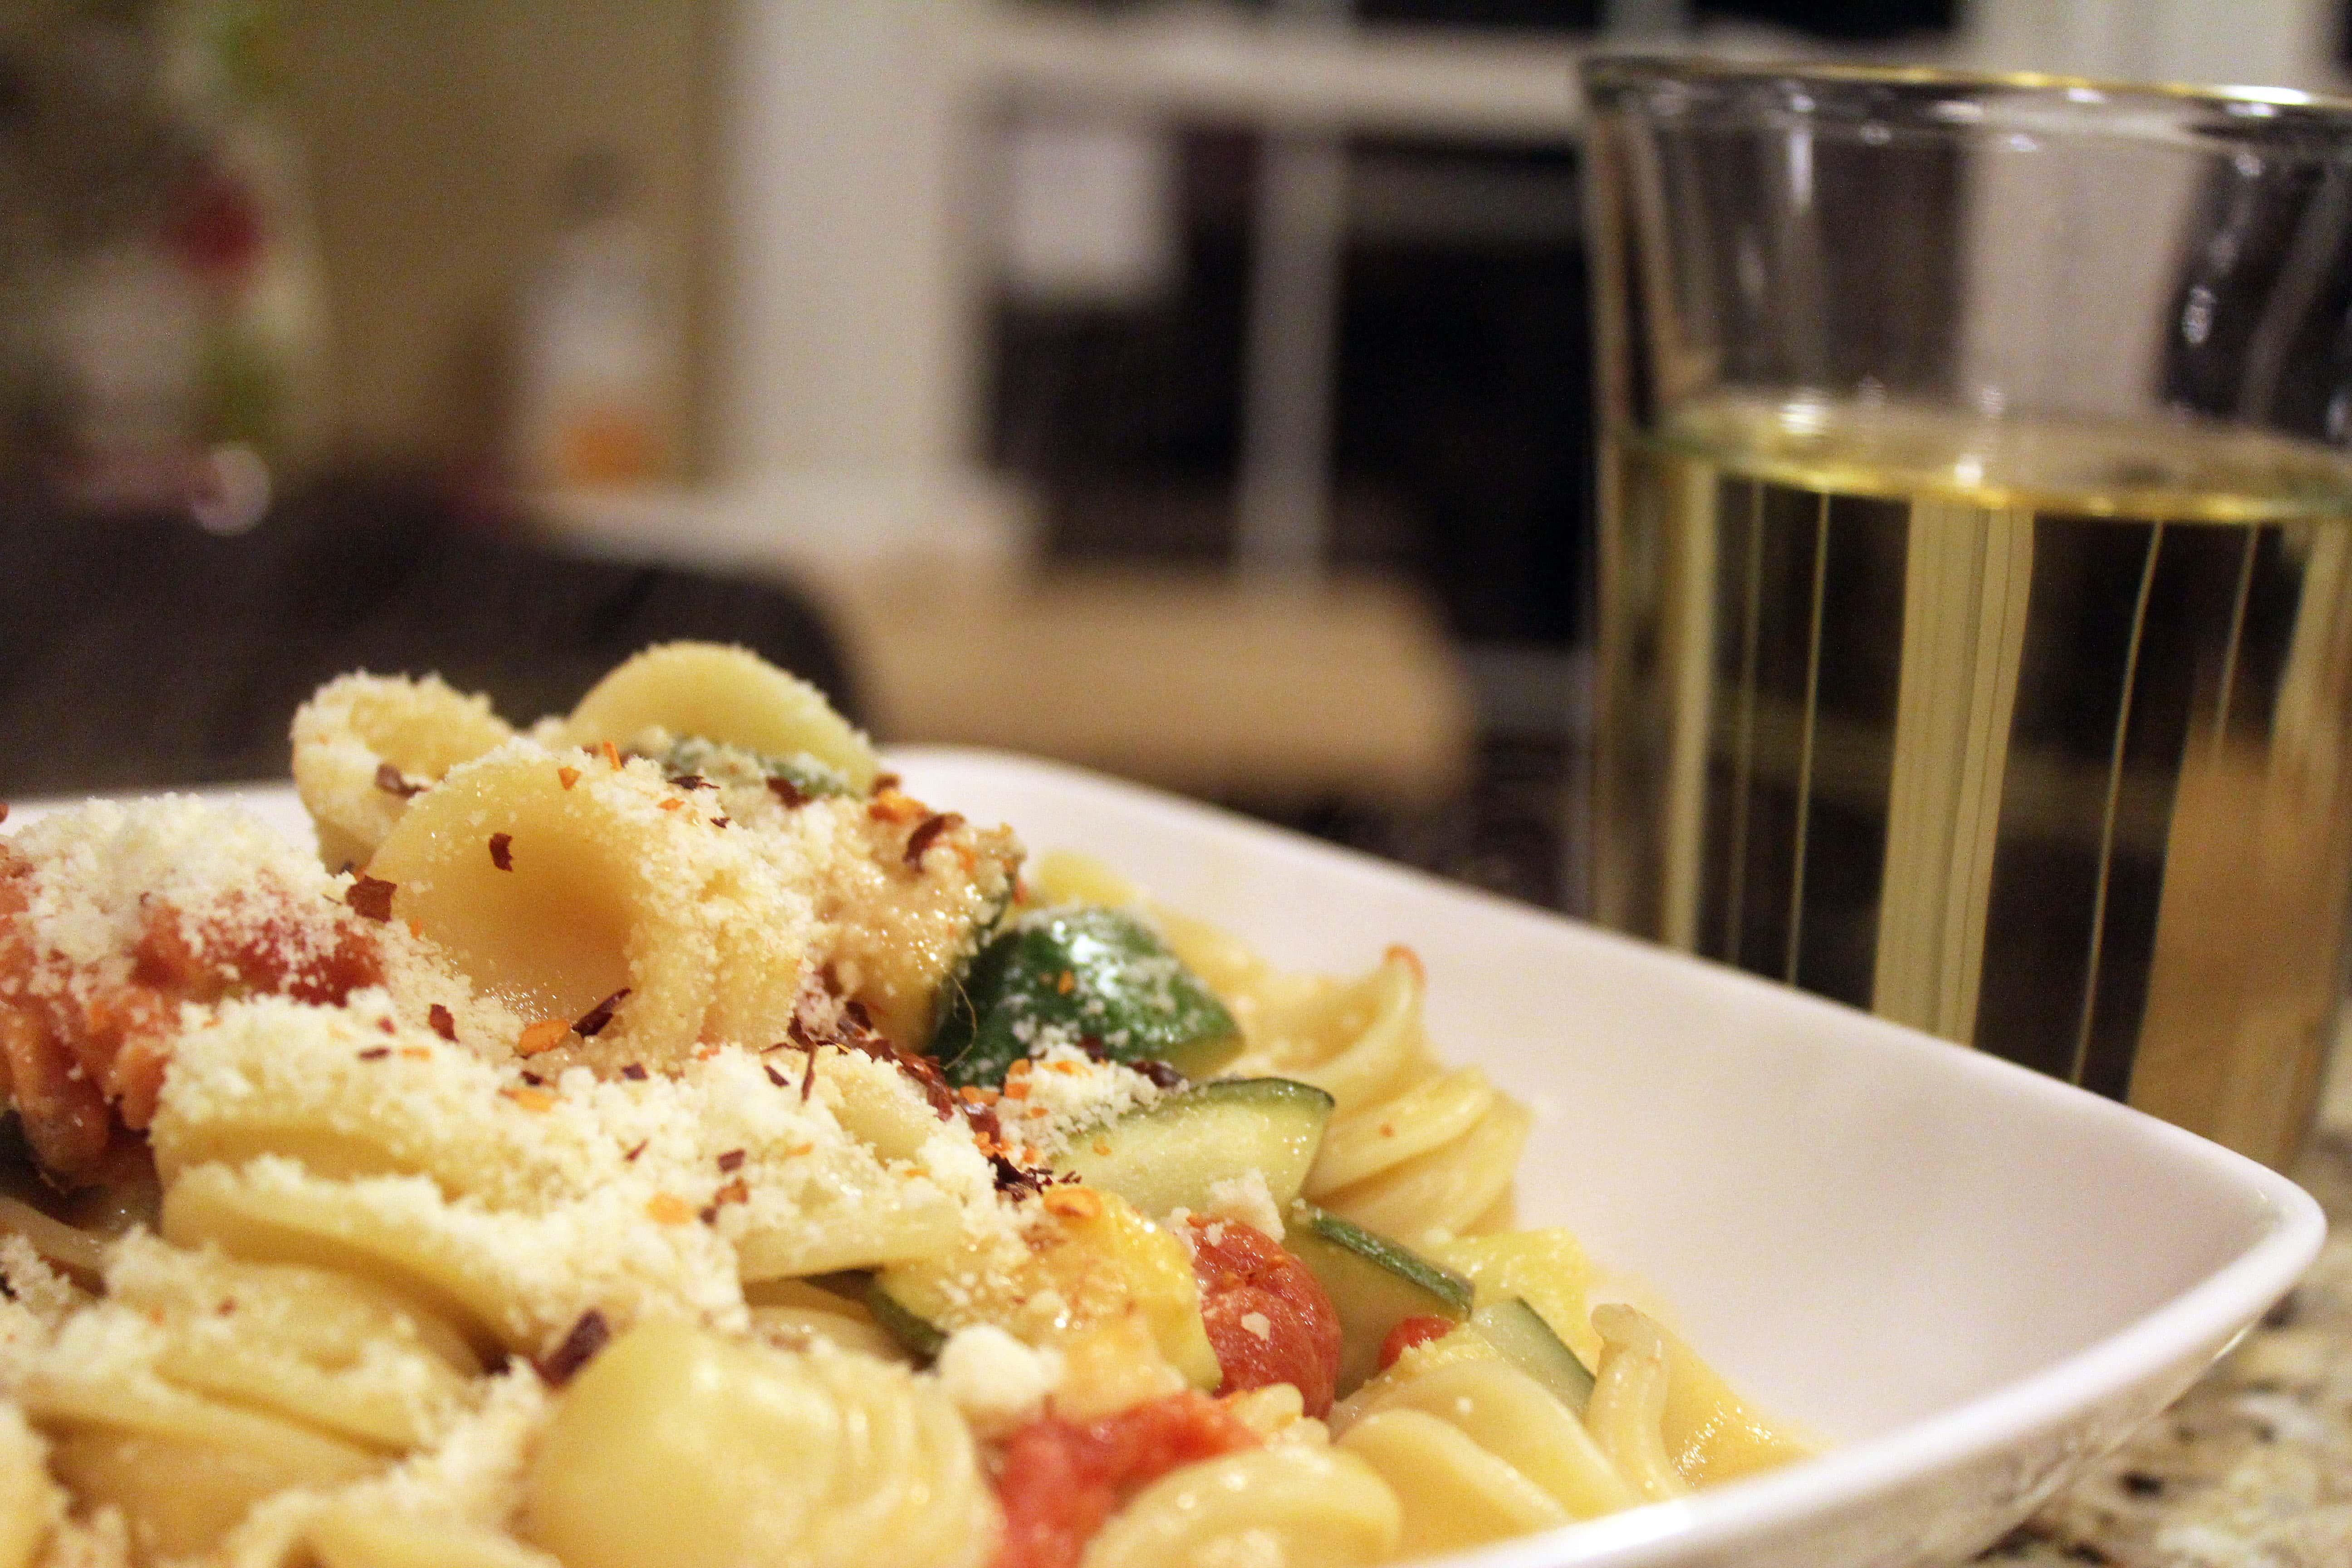 Serve pasta with wine